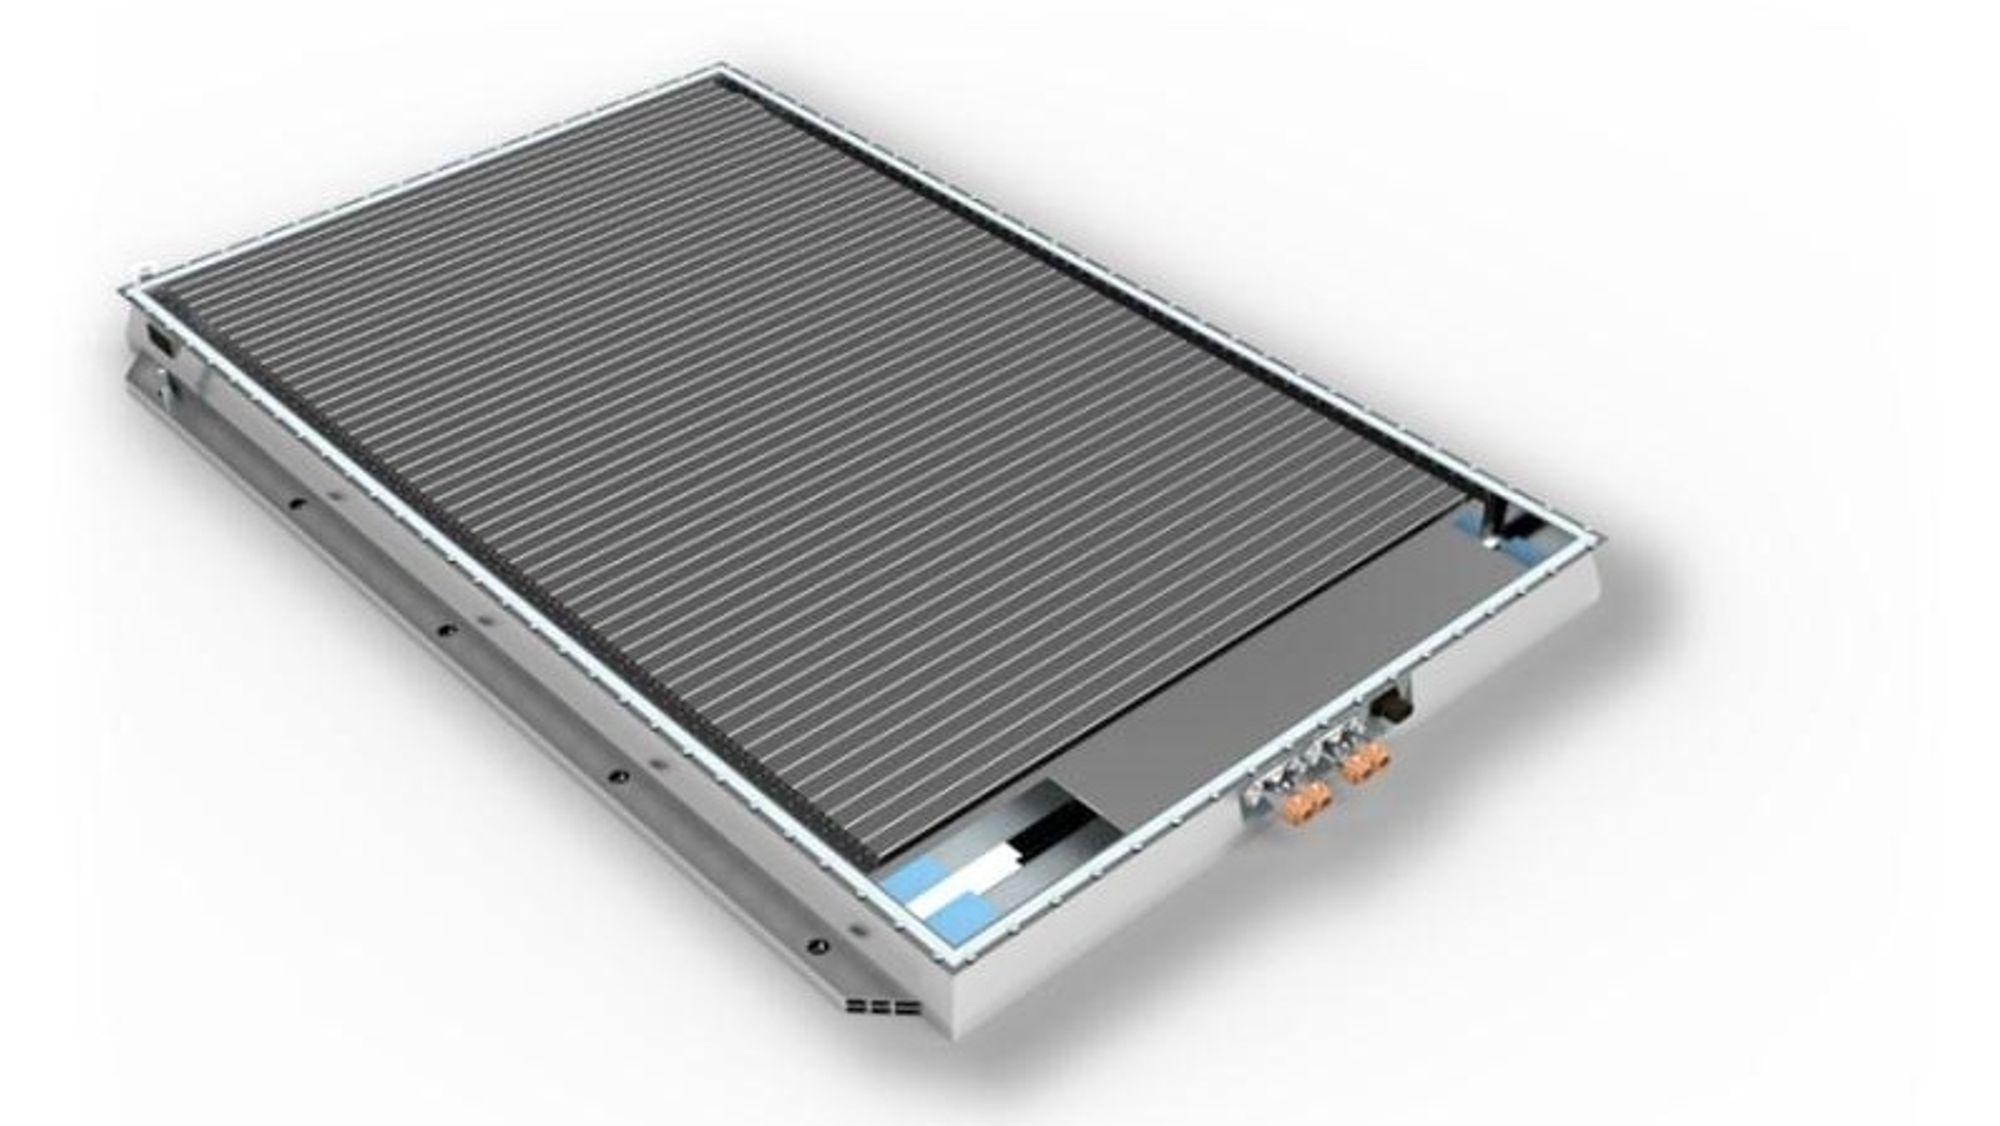 Blade Battery skal verken eksplodere eller brenne, ifølge BYD.